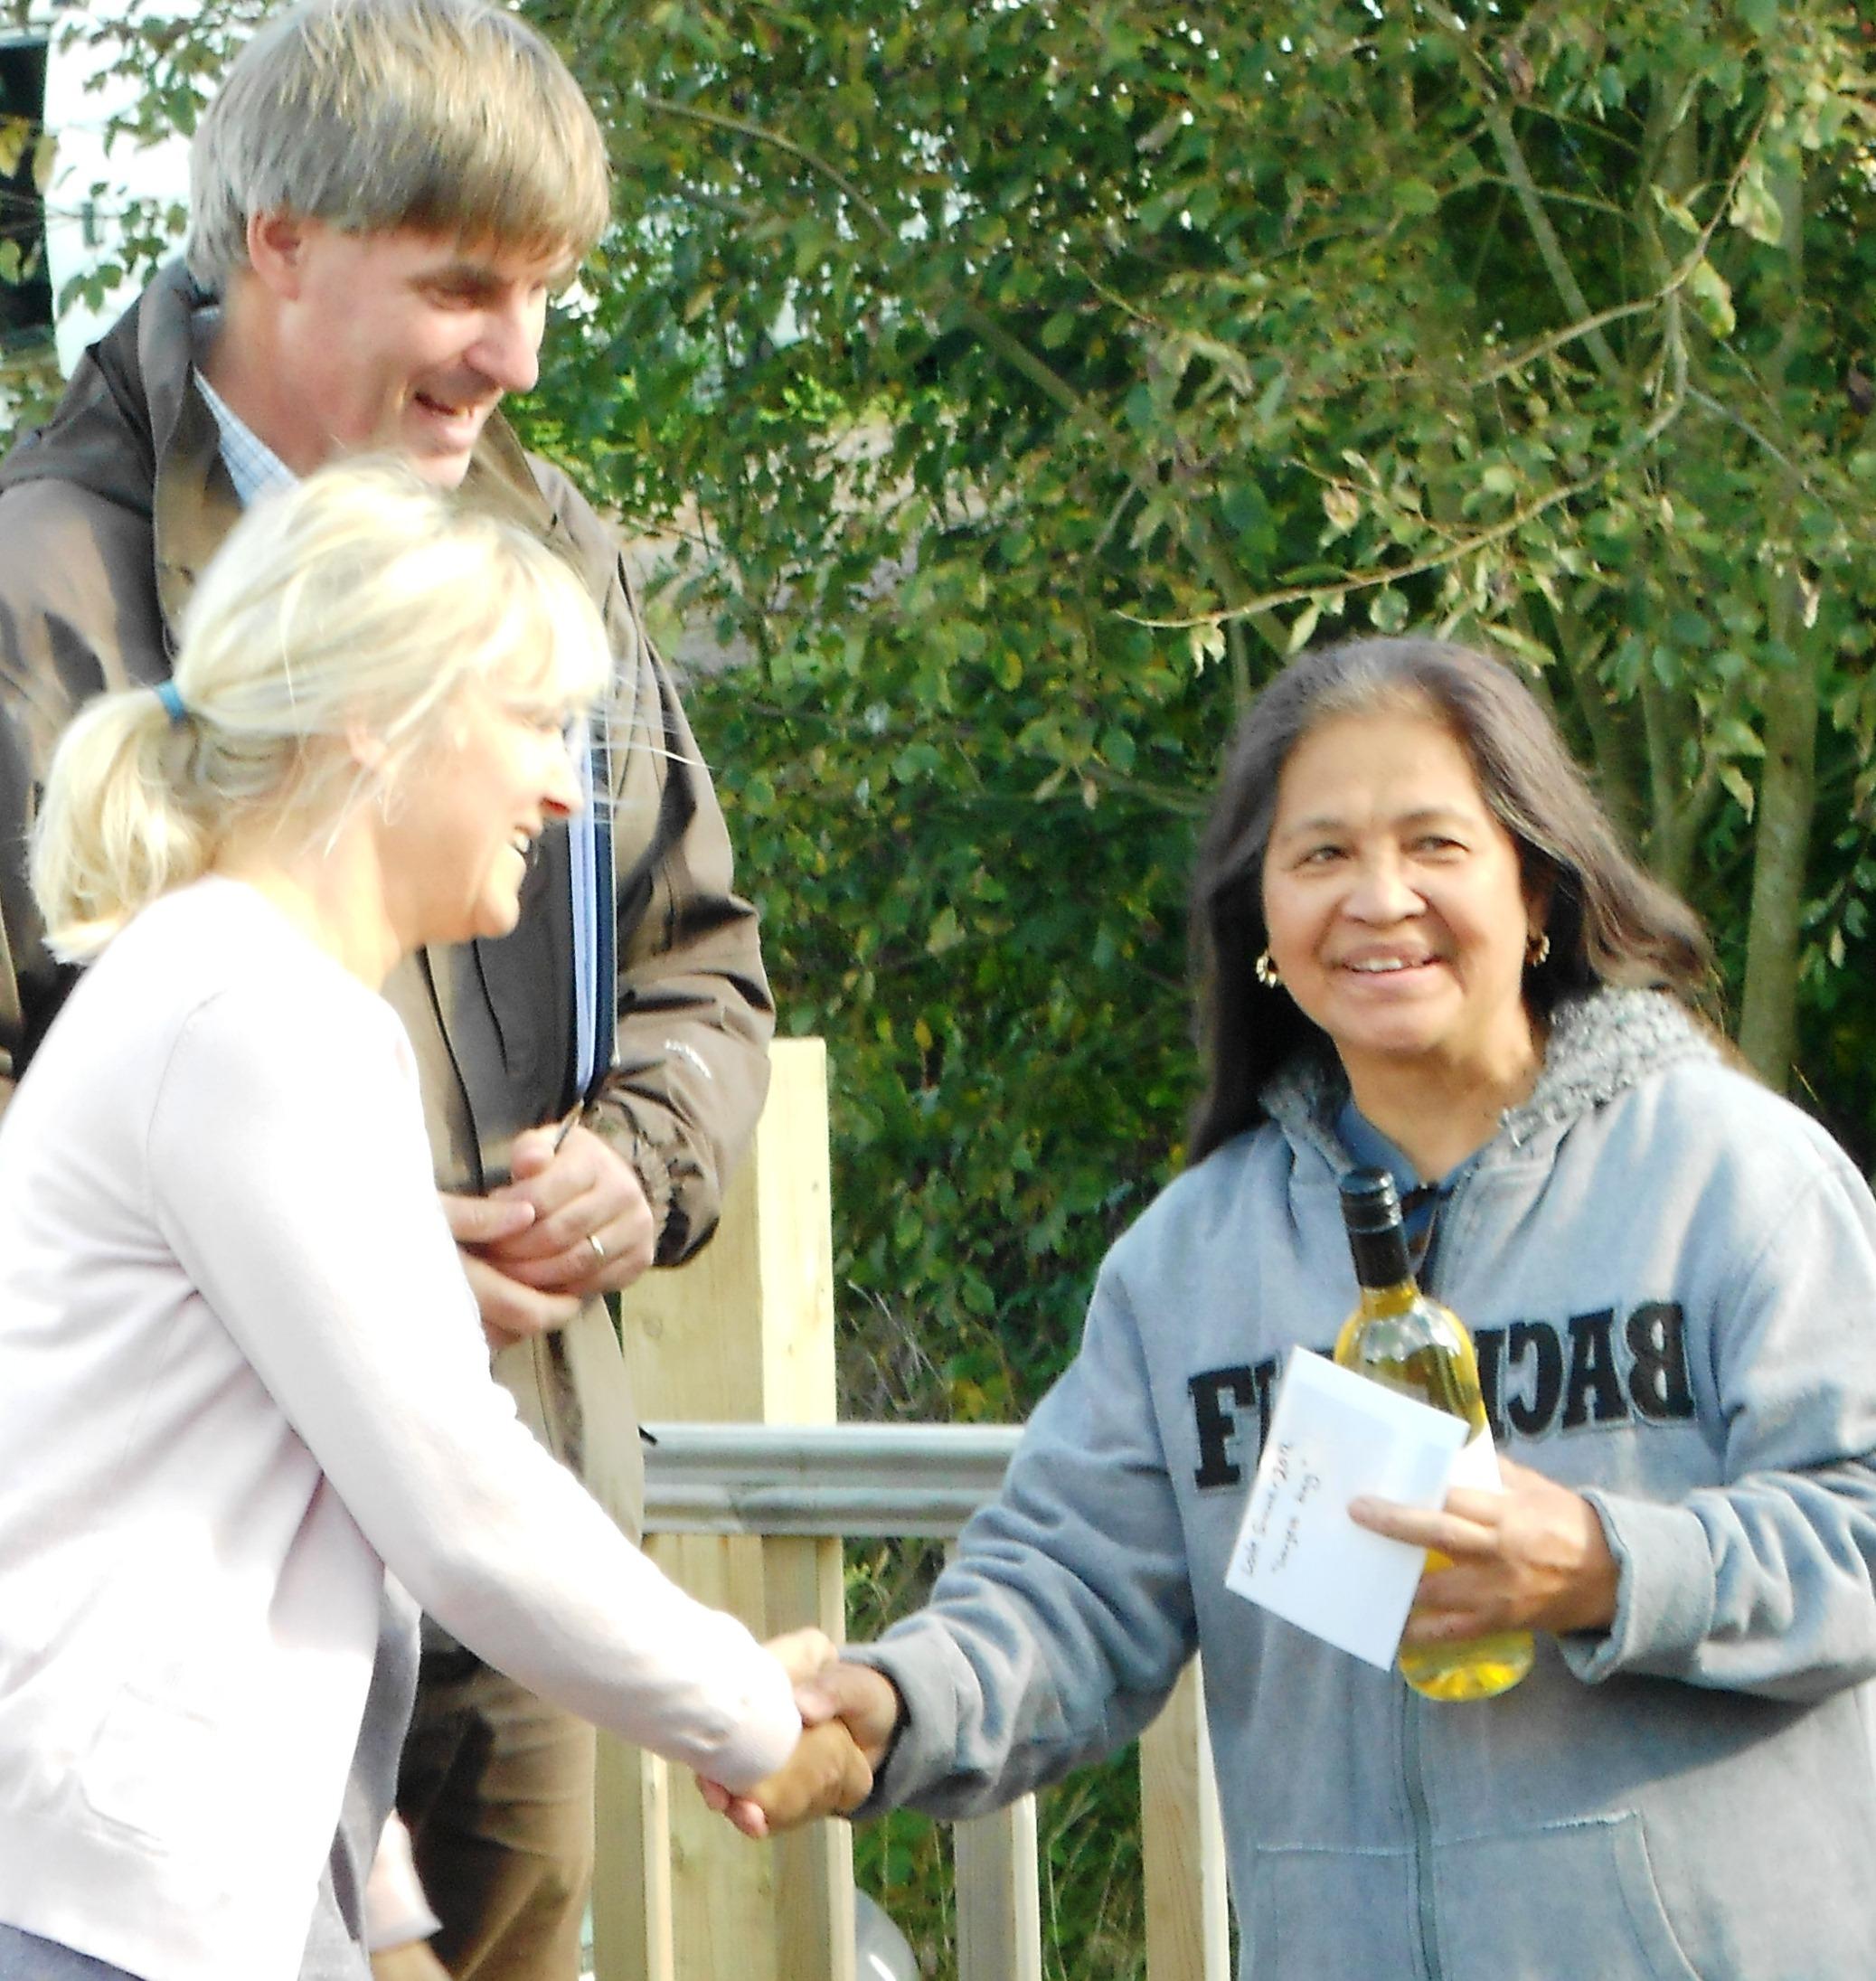 Marina Aylett wins heaviest bag at Brick Farm Lakes Late Summer Competition